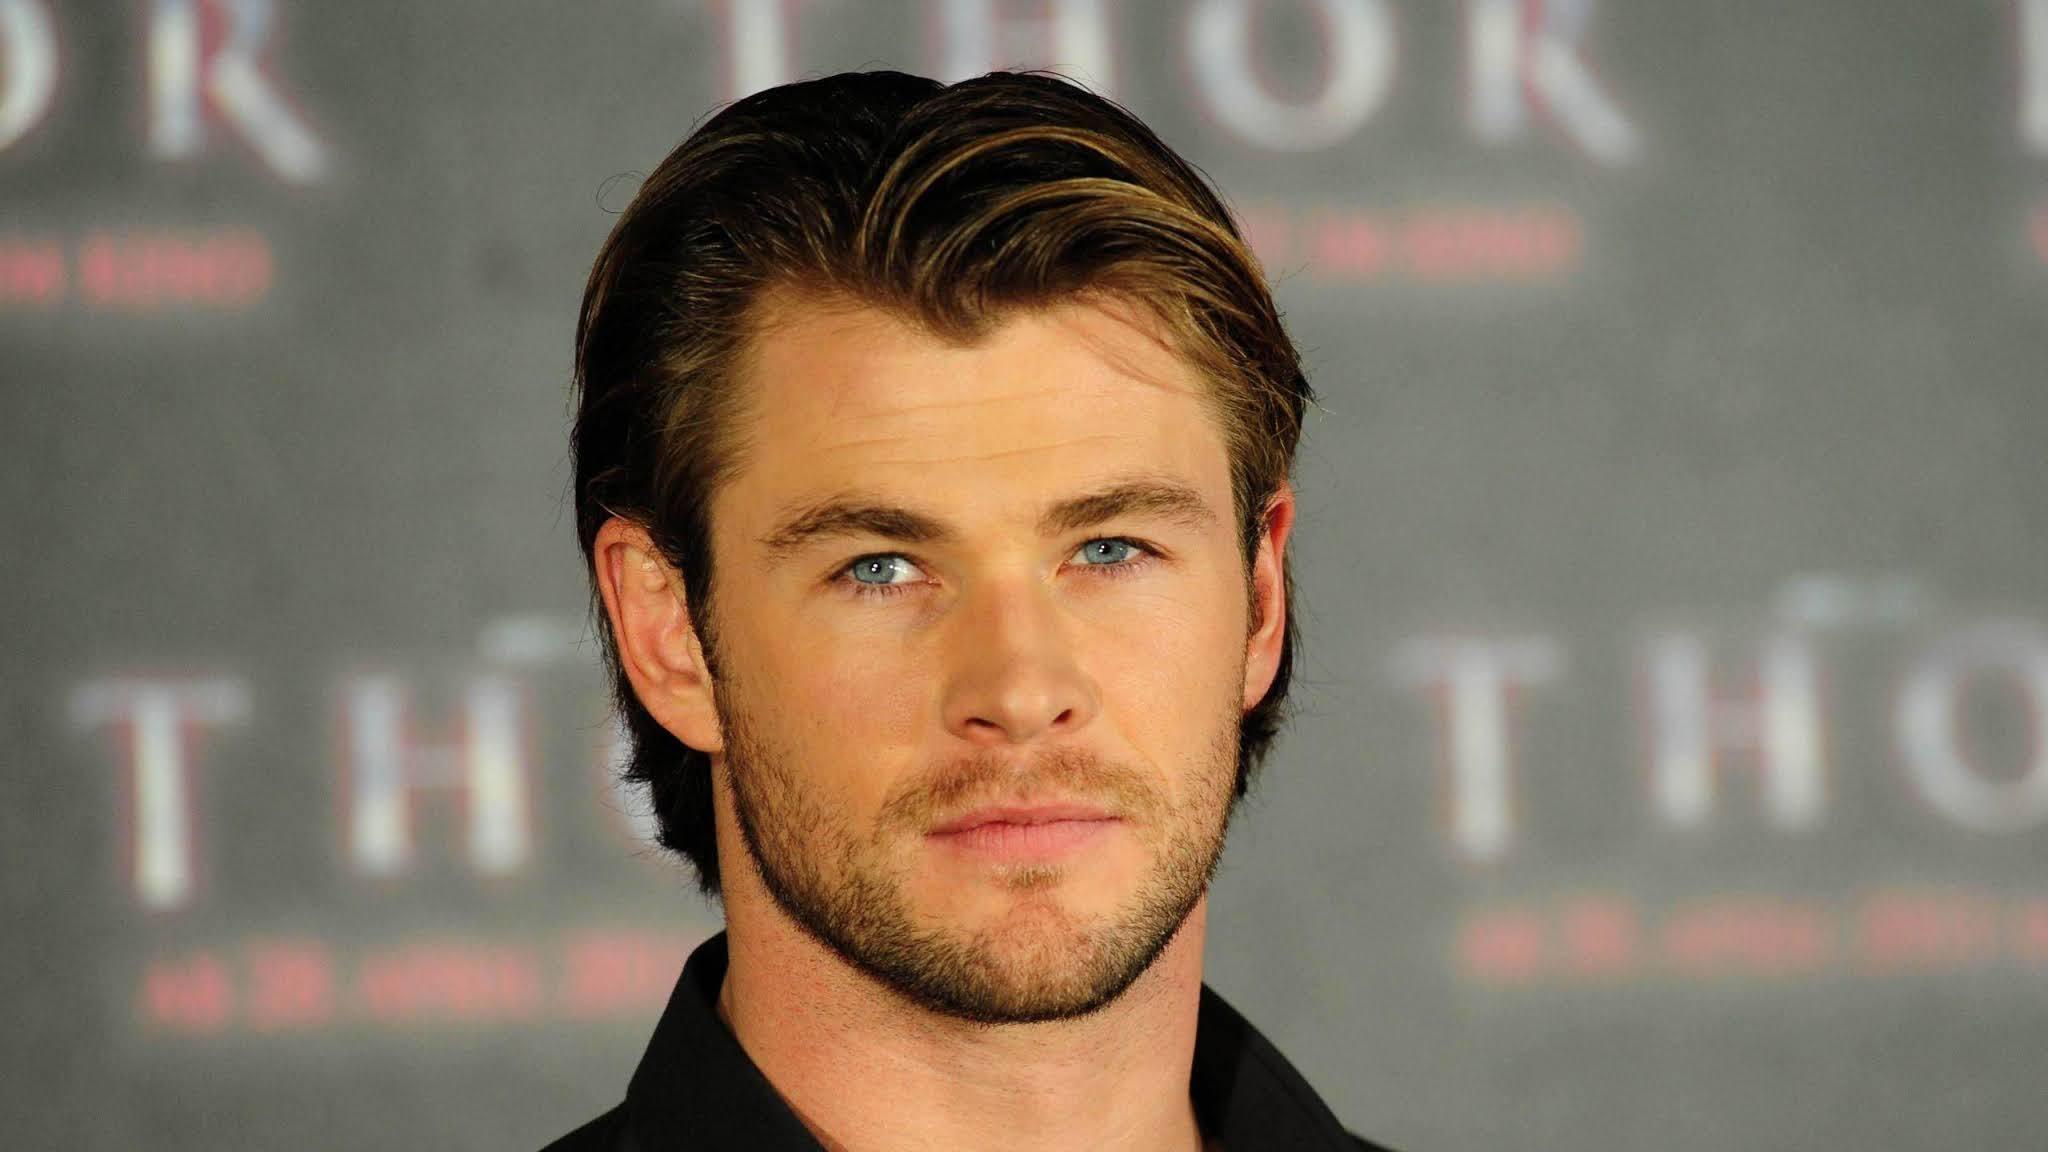 Chris Hemsworth look